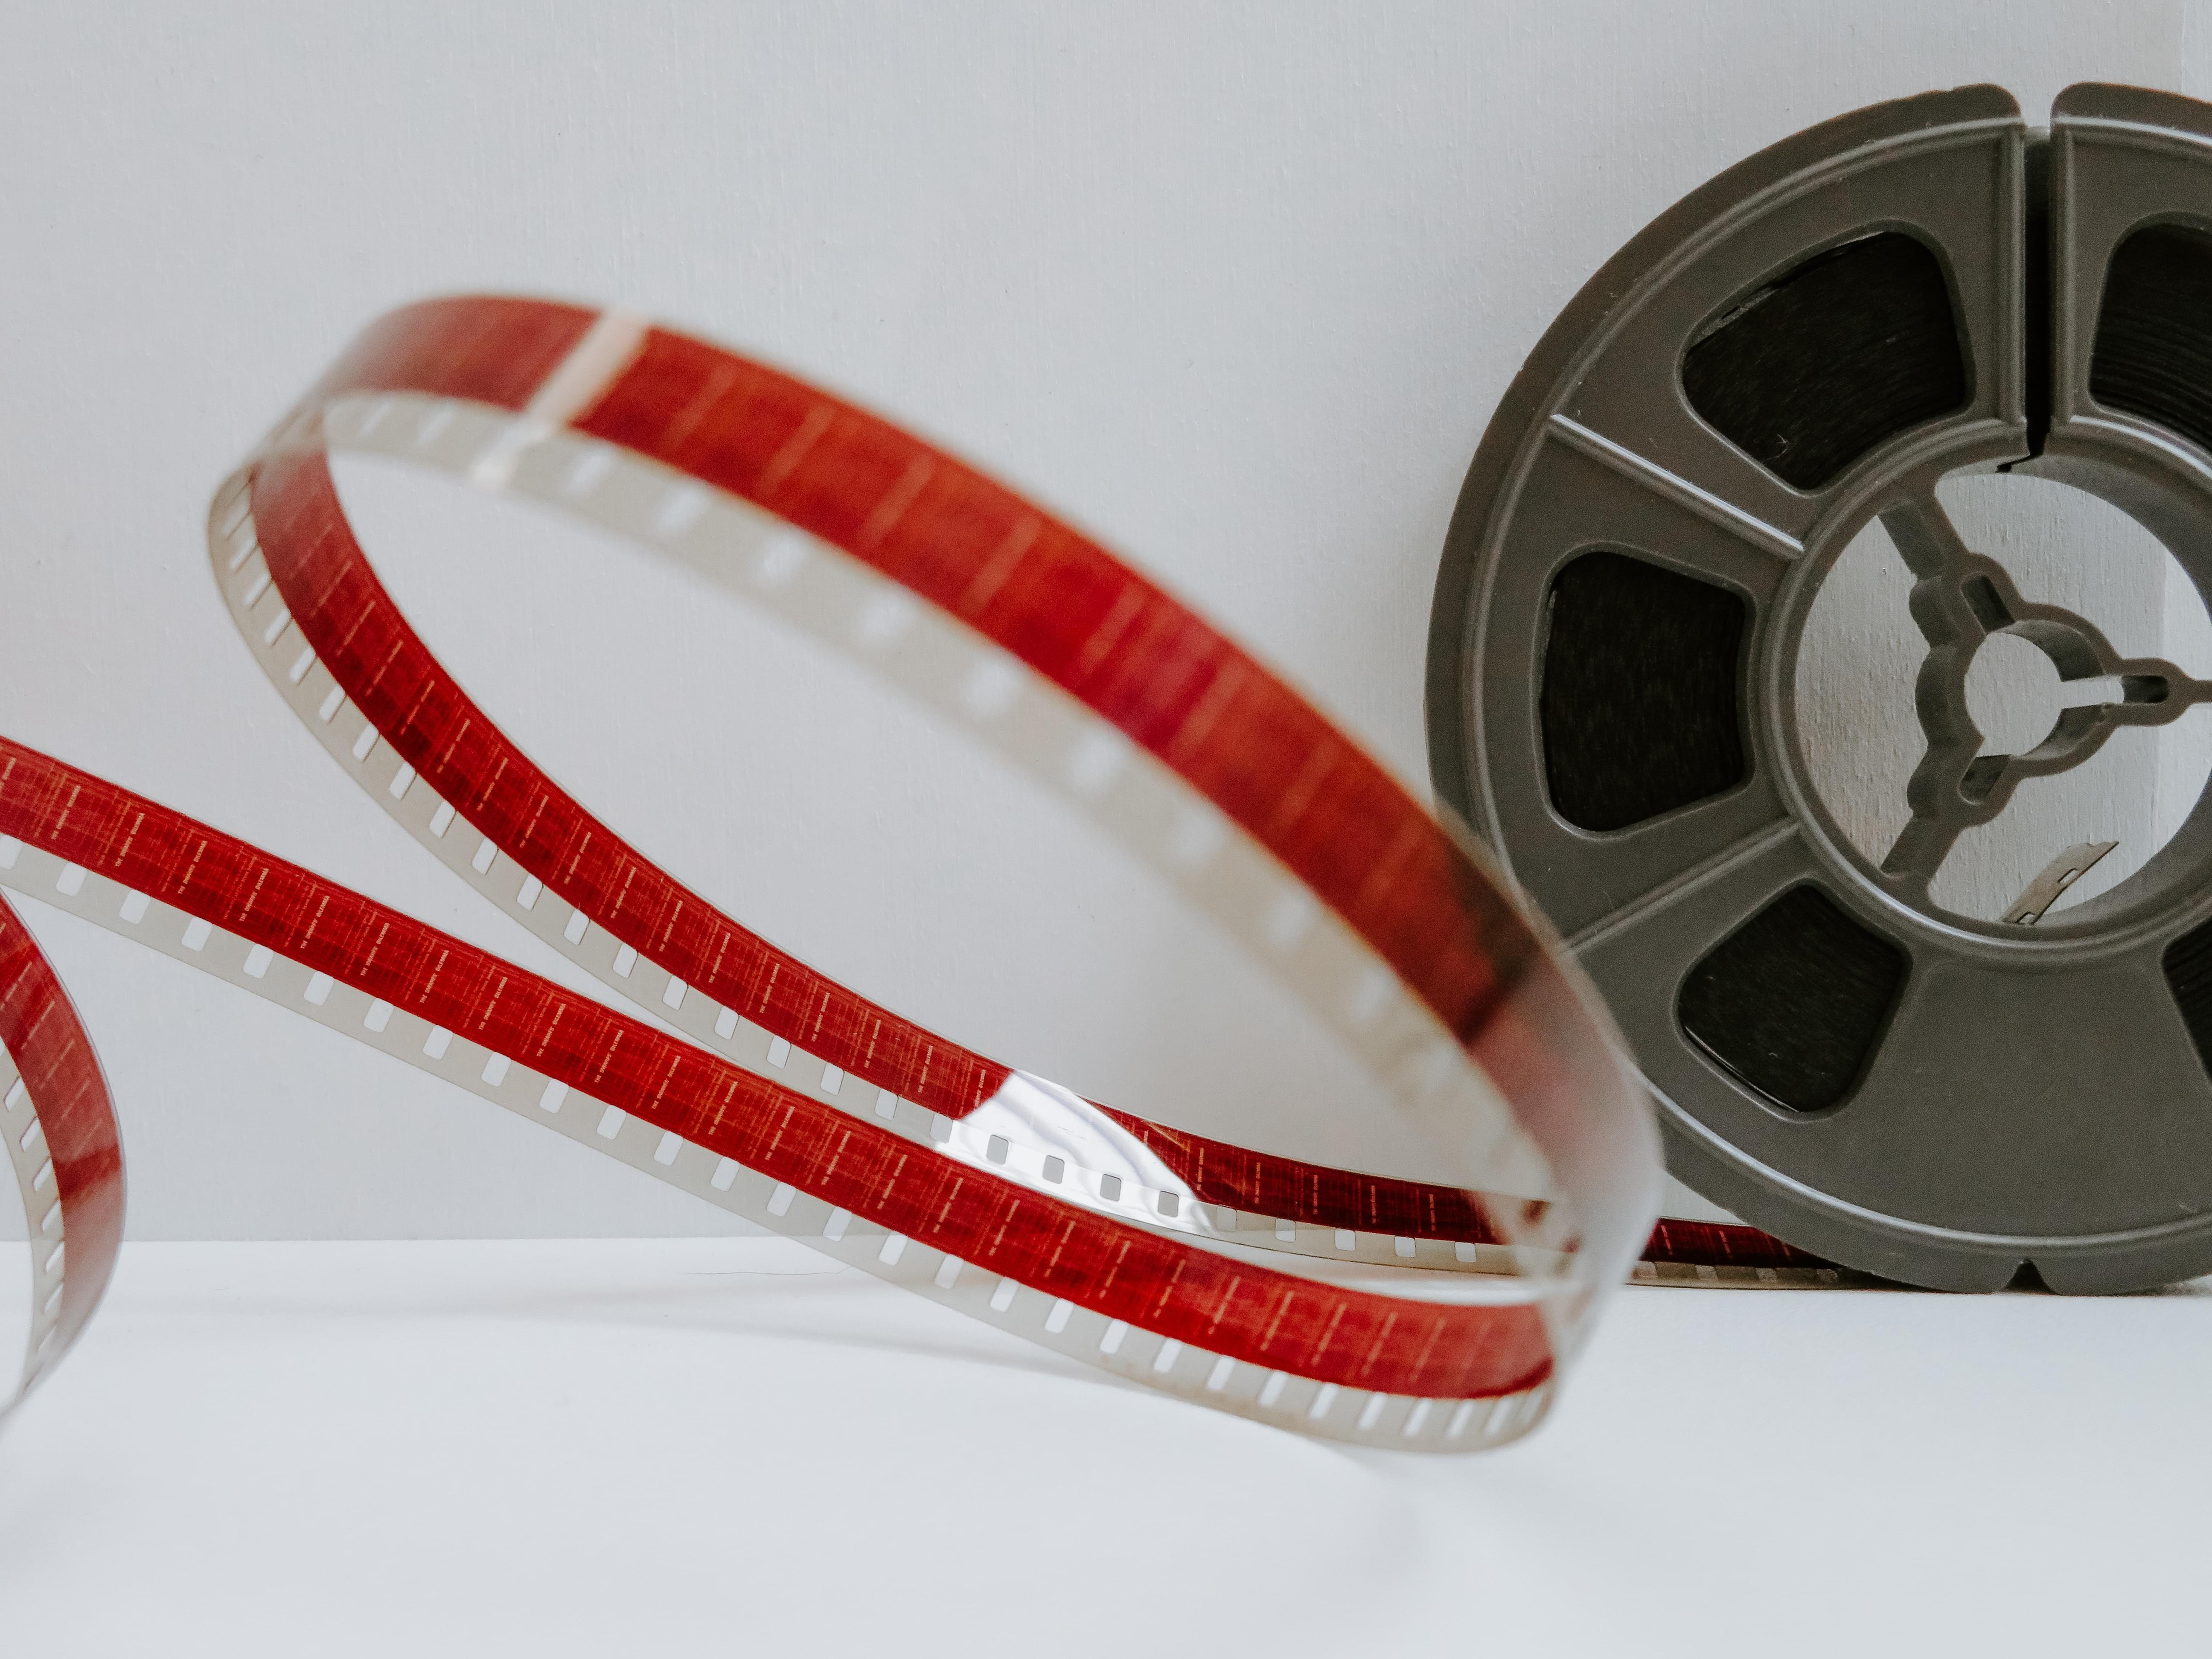 movie film - denise-jans-xq1eWTas_a0-unsplash